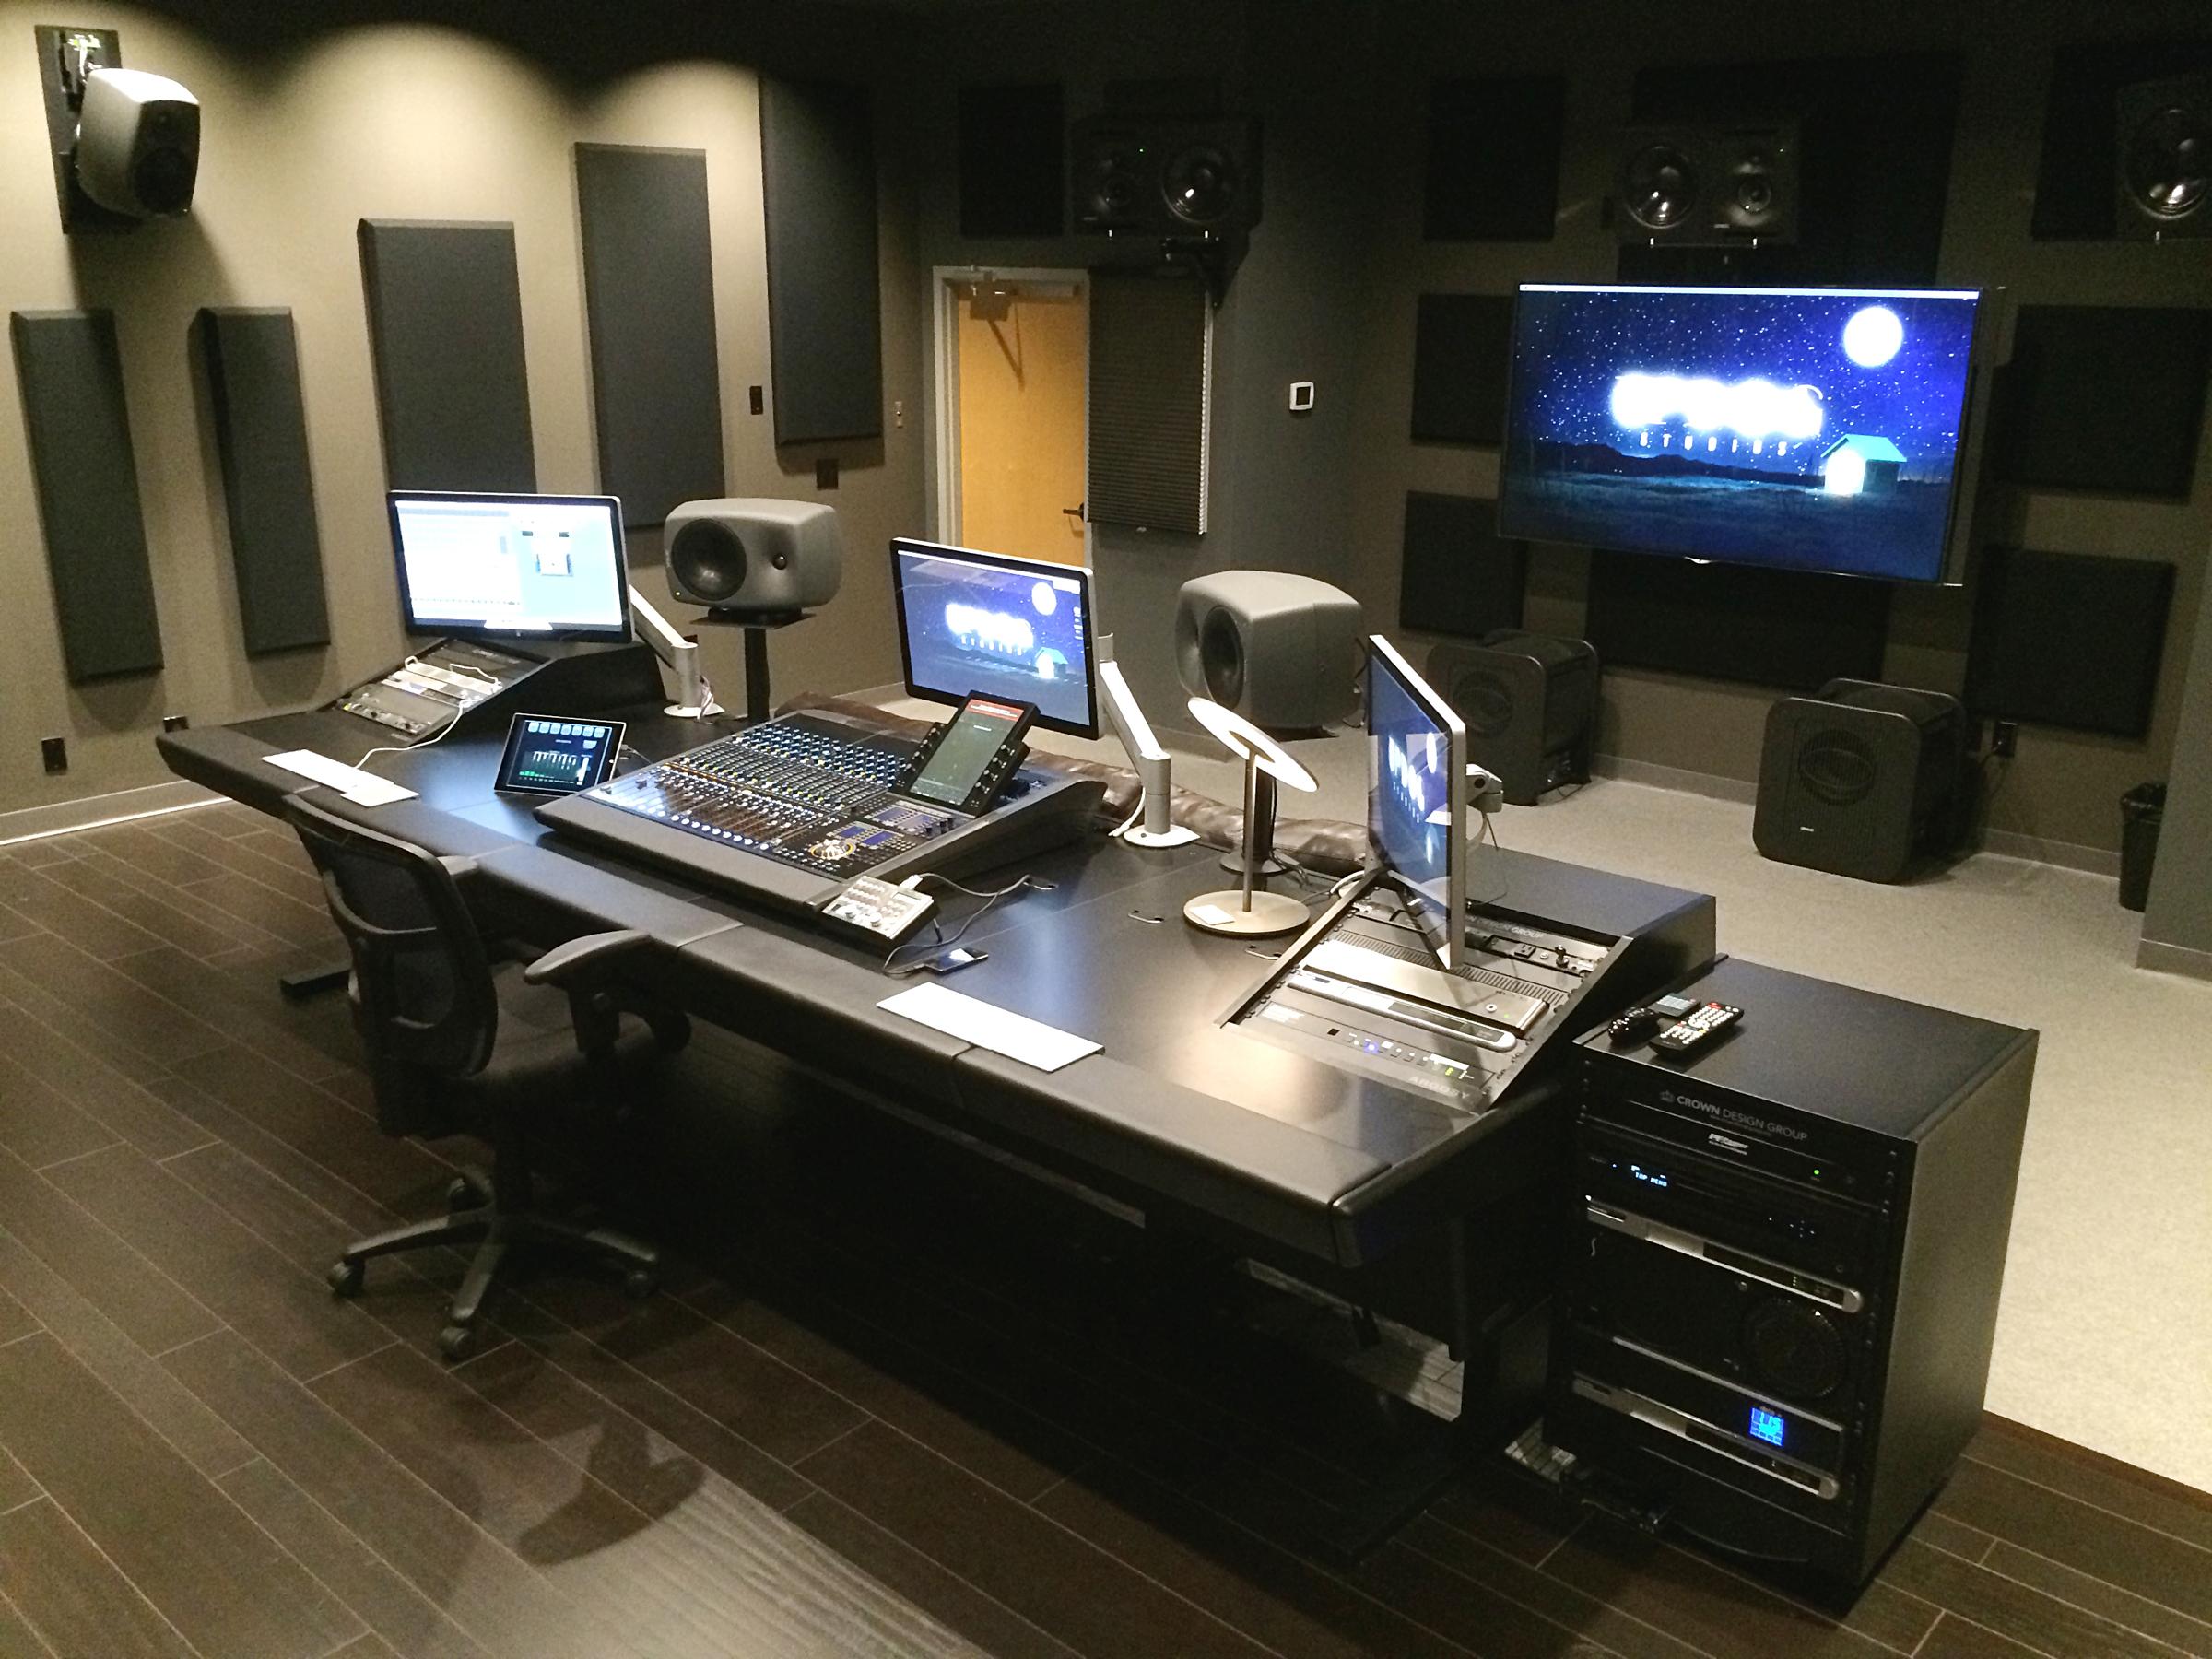 http://clynemedia.com/genelec/Updog/Updog_Studio.JPG